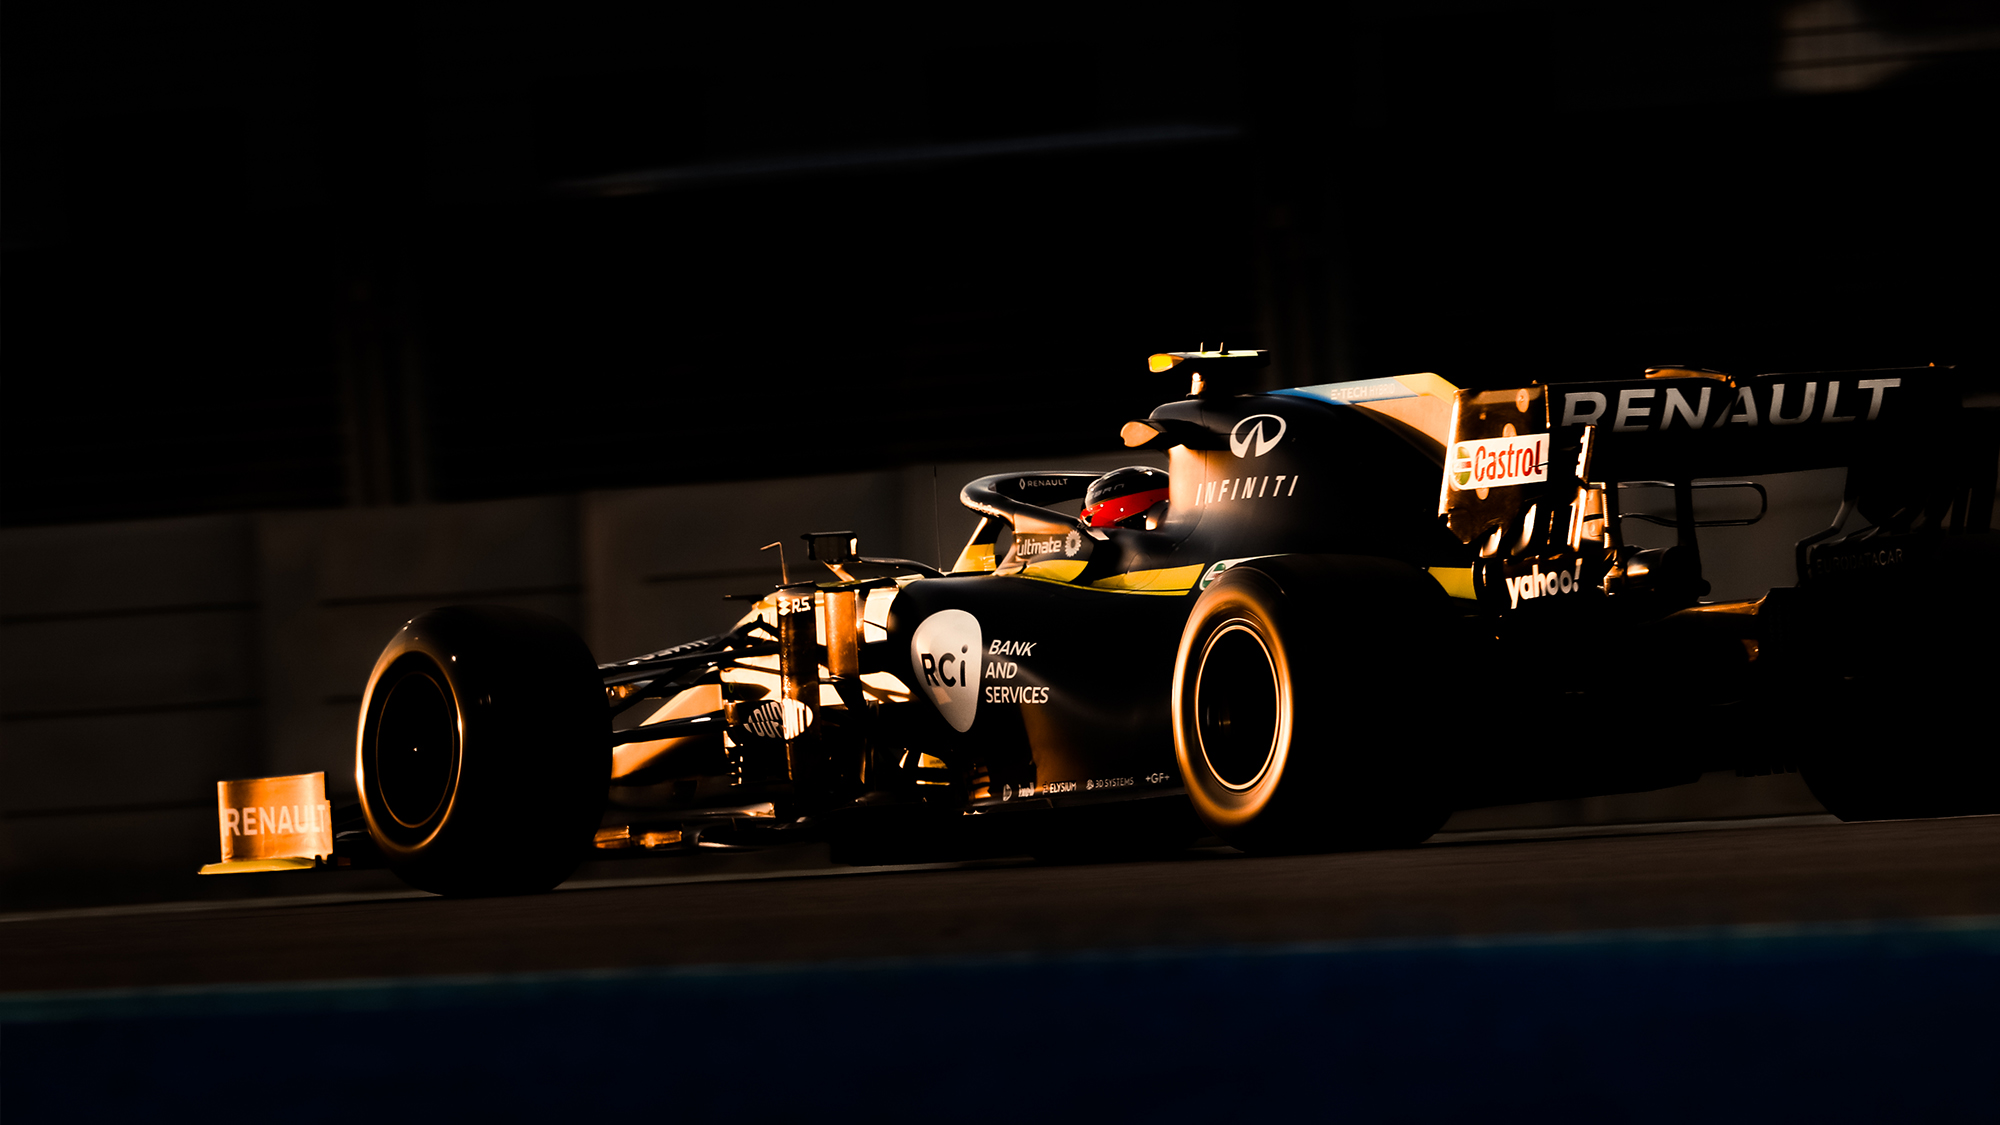 Esteban Ocon during qualifying for the 2020 Abu Dhabi Grand Prix